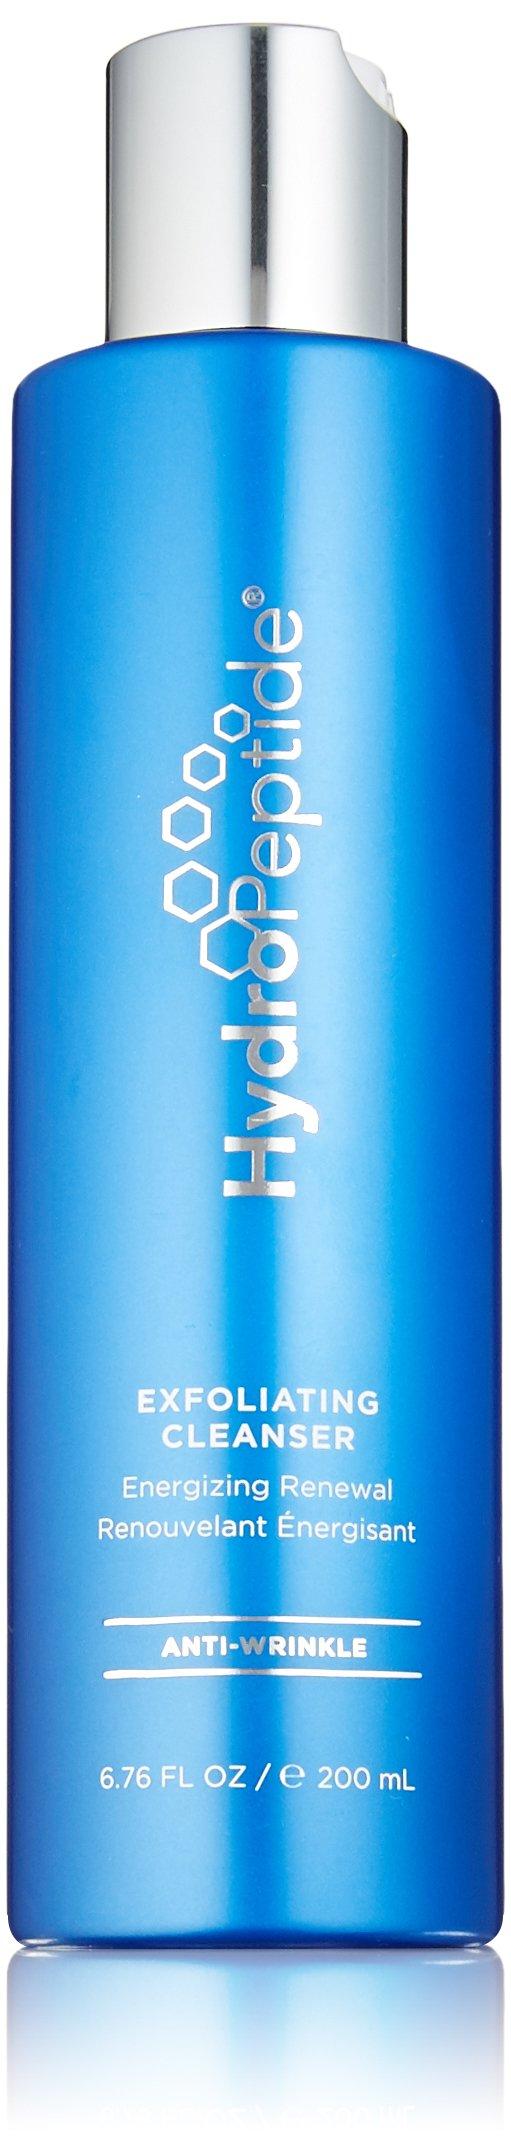 HydroPeptide Exfoliating Energizing Renewal Cleanser, 6.76 fl. oz.